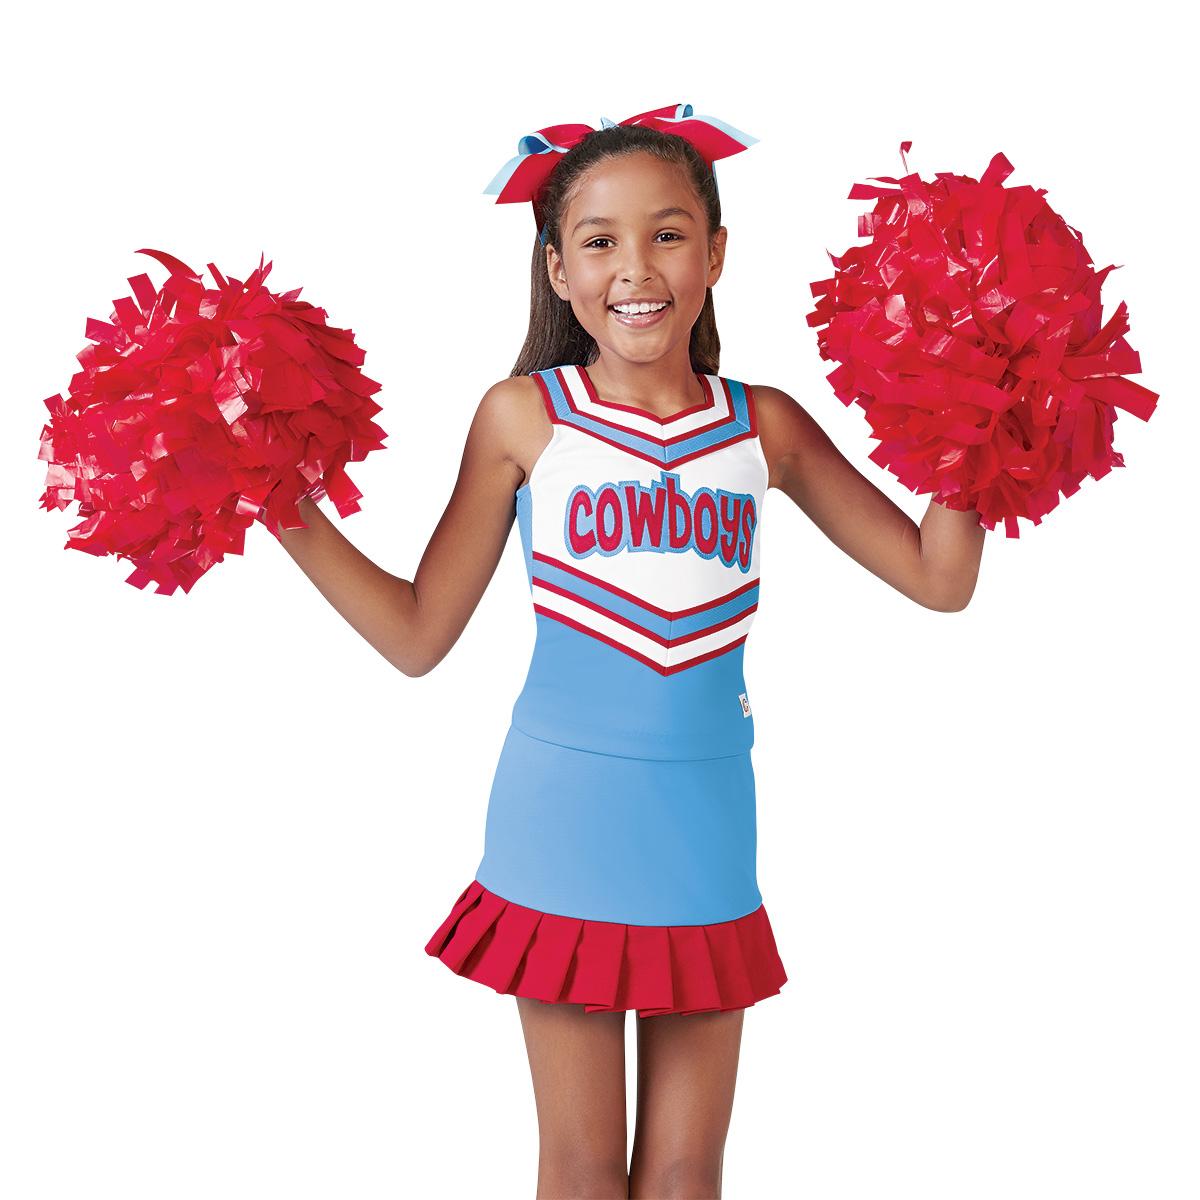 6 Quot In Stock Plastic 3 Color Baton Handle Cheerleading Pom